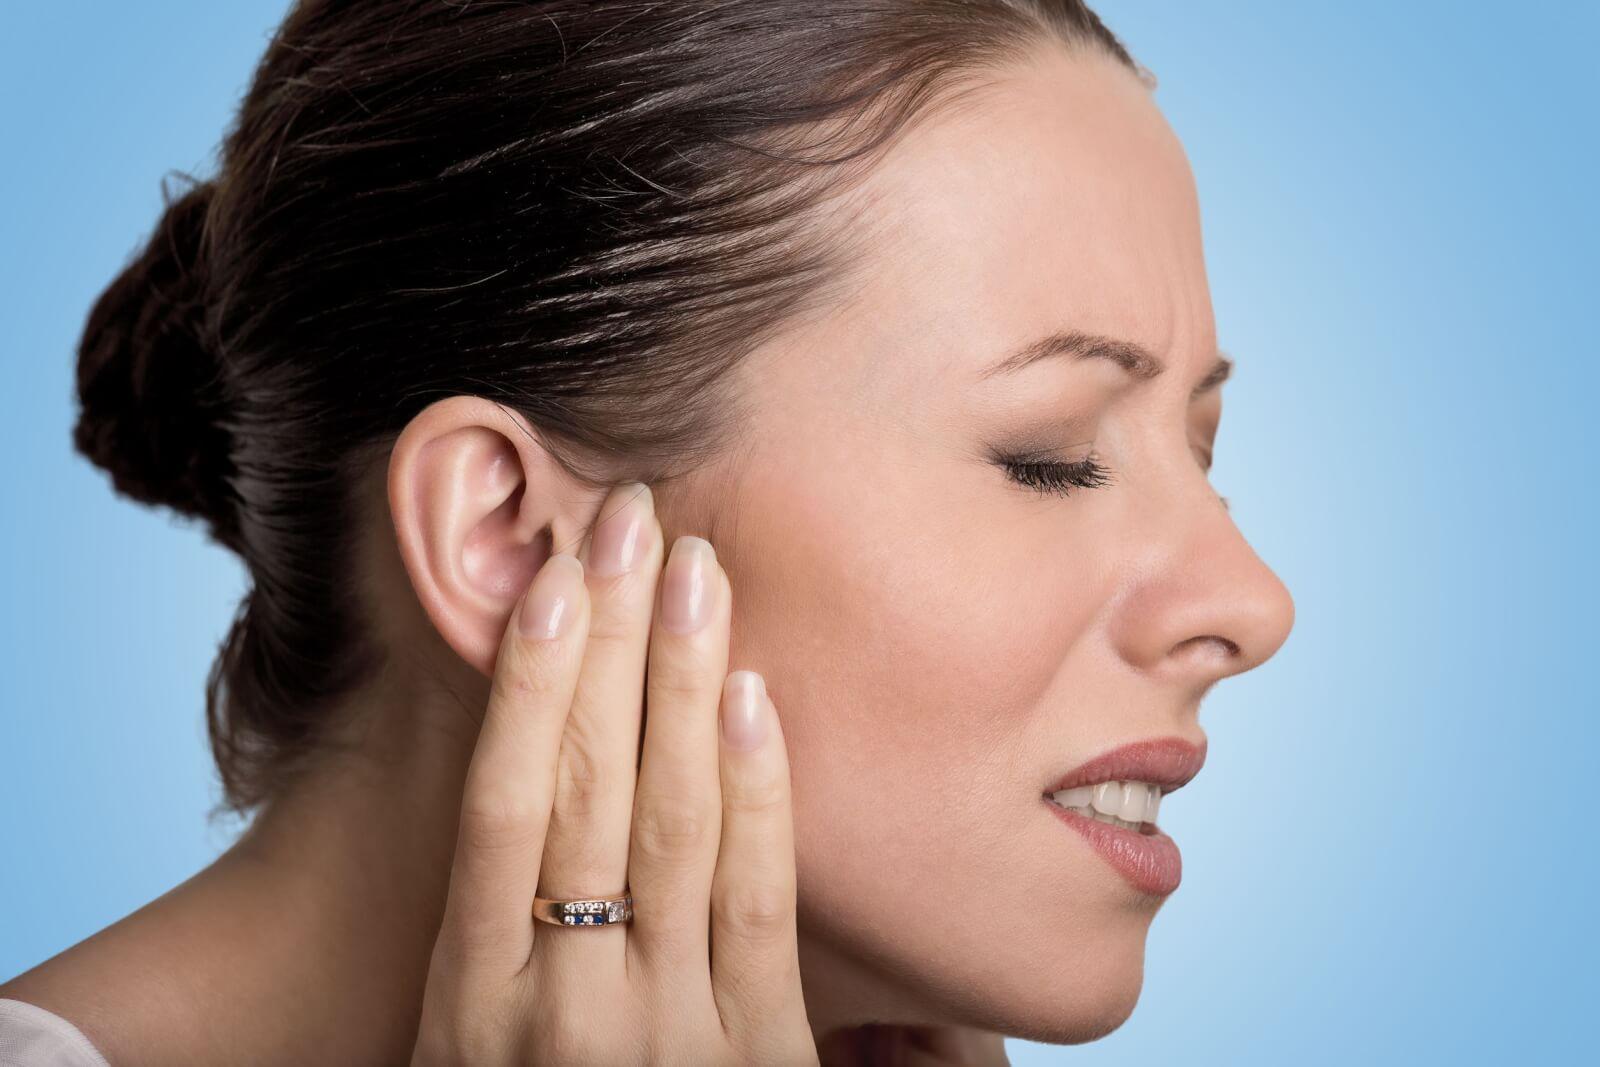 Опухла мочка уха и болит